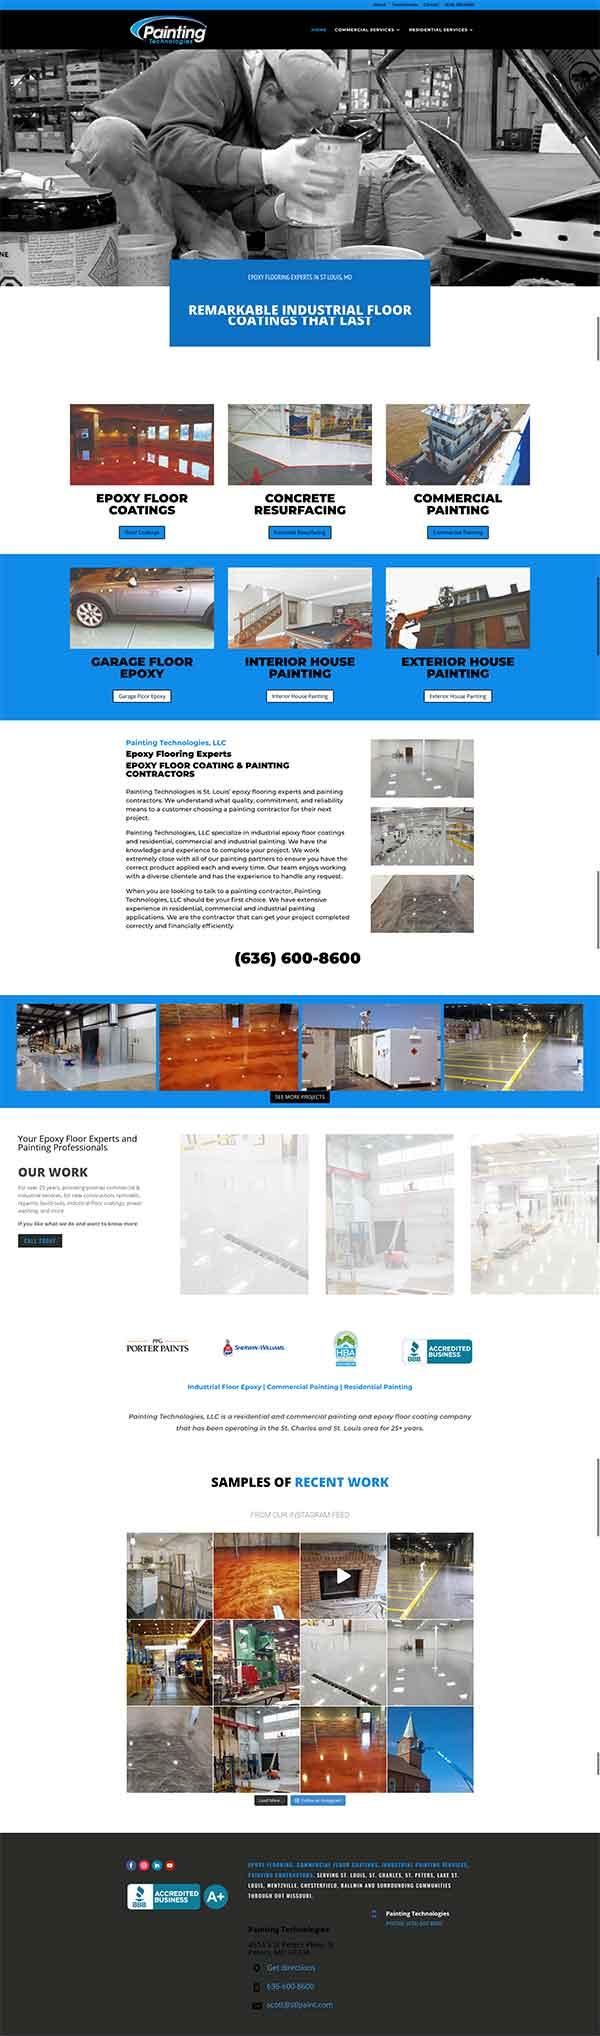 painting-technologies-web-design-case-study